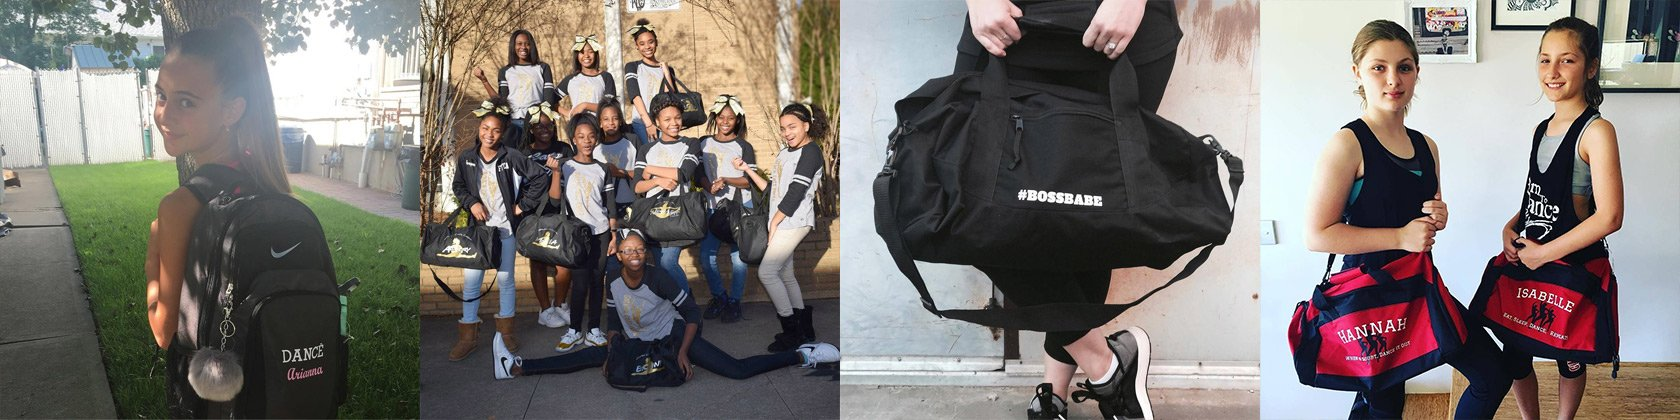 ef4575ad37cb Custom Dance Bags, Personalized Dance Duffel Bags